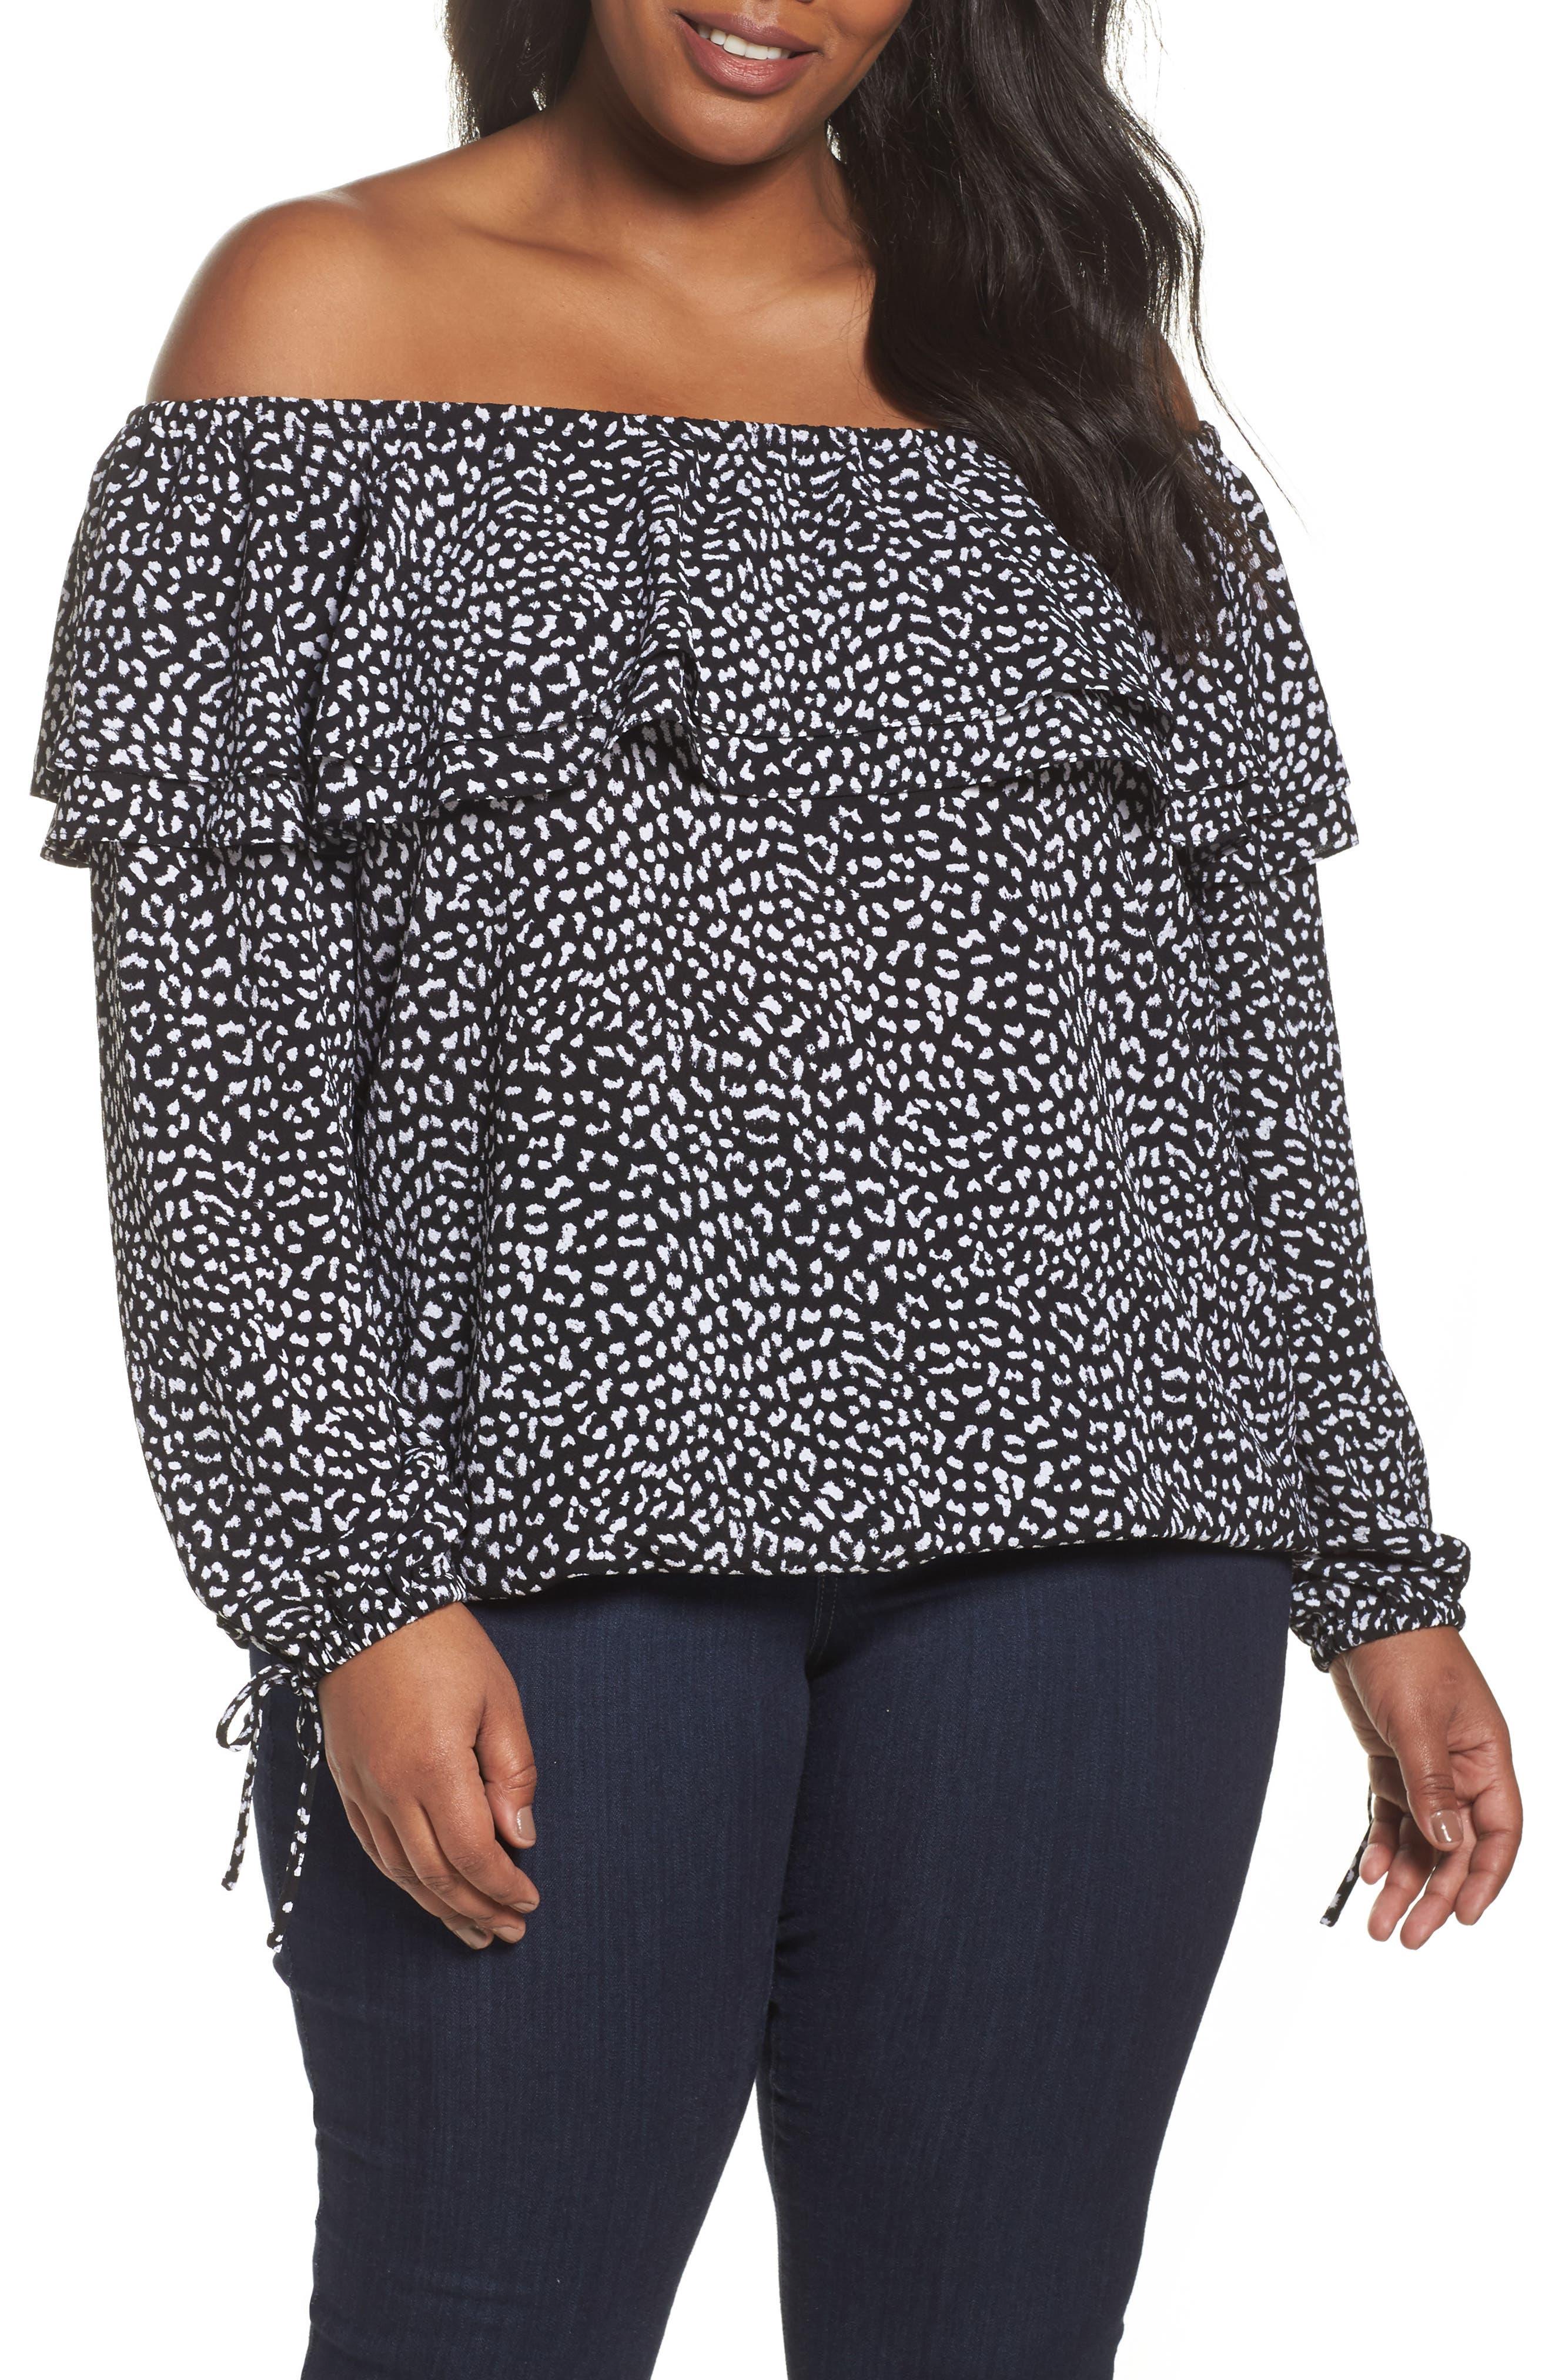 Main Image - MICHAEL Michael Kors Cheetah Print Off the Shoulder Top (Plus Size)